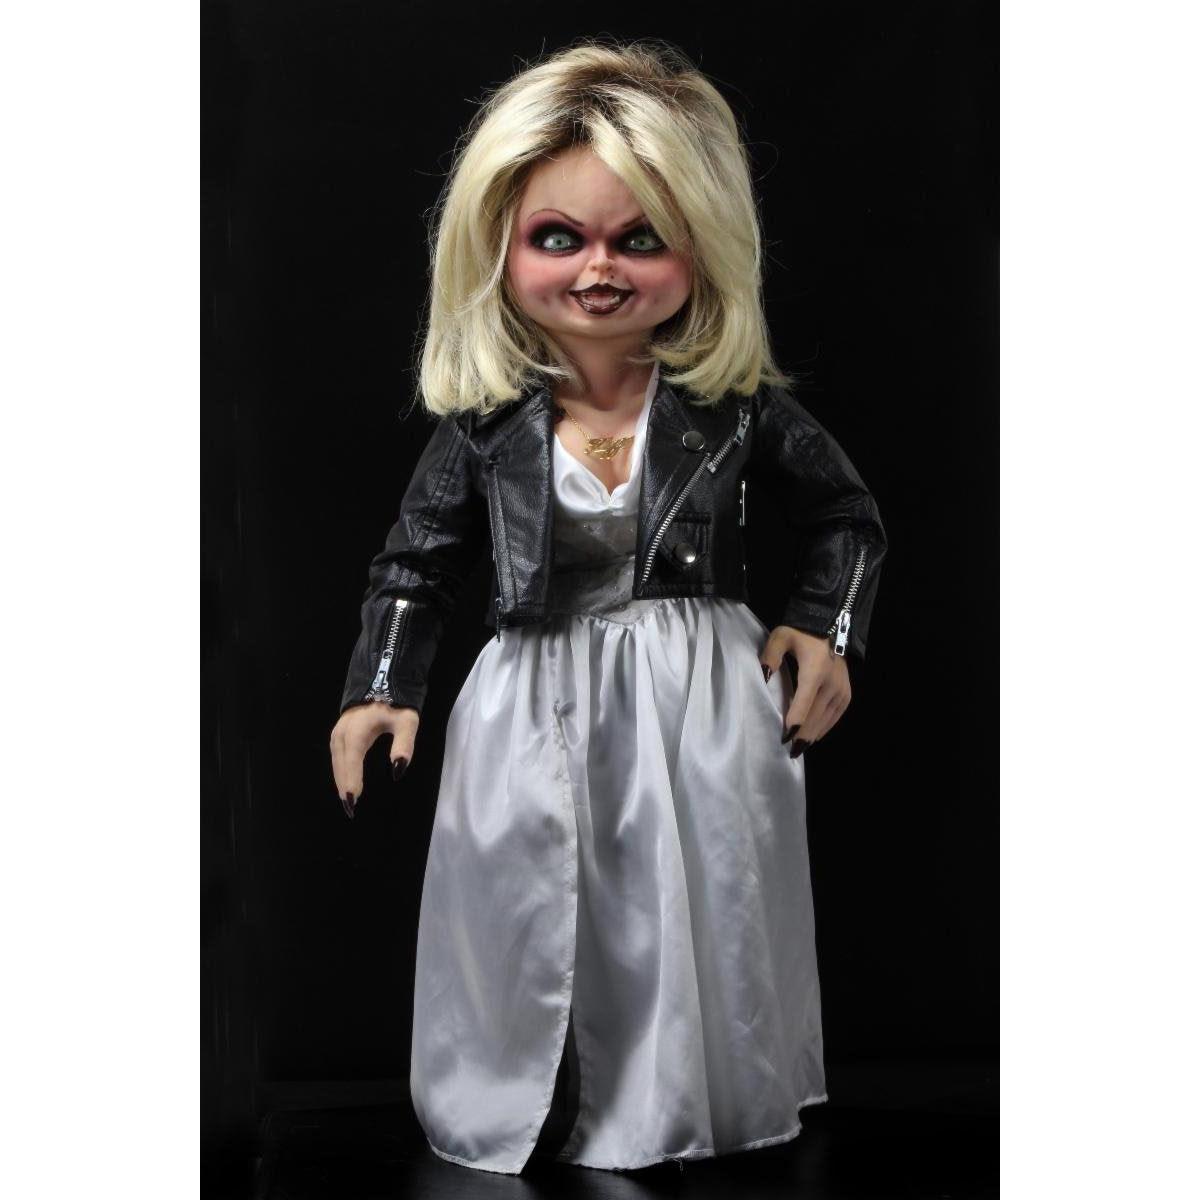 Image of Bride of Chucky - 1:1 Replica - Life-Size Tiffany - FEBRUARY 2020